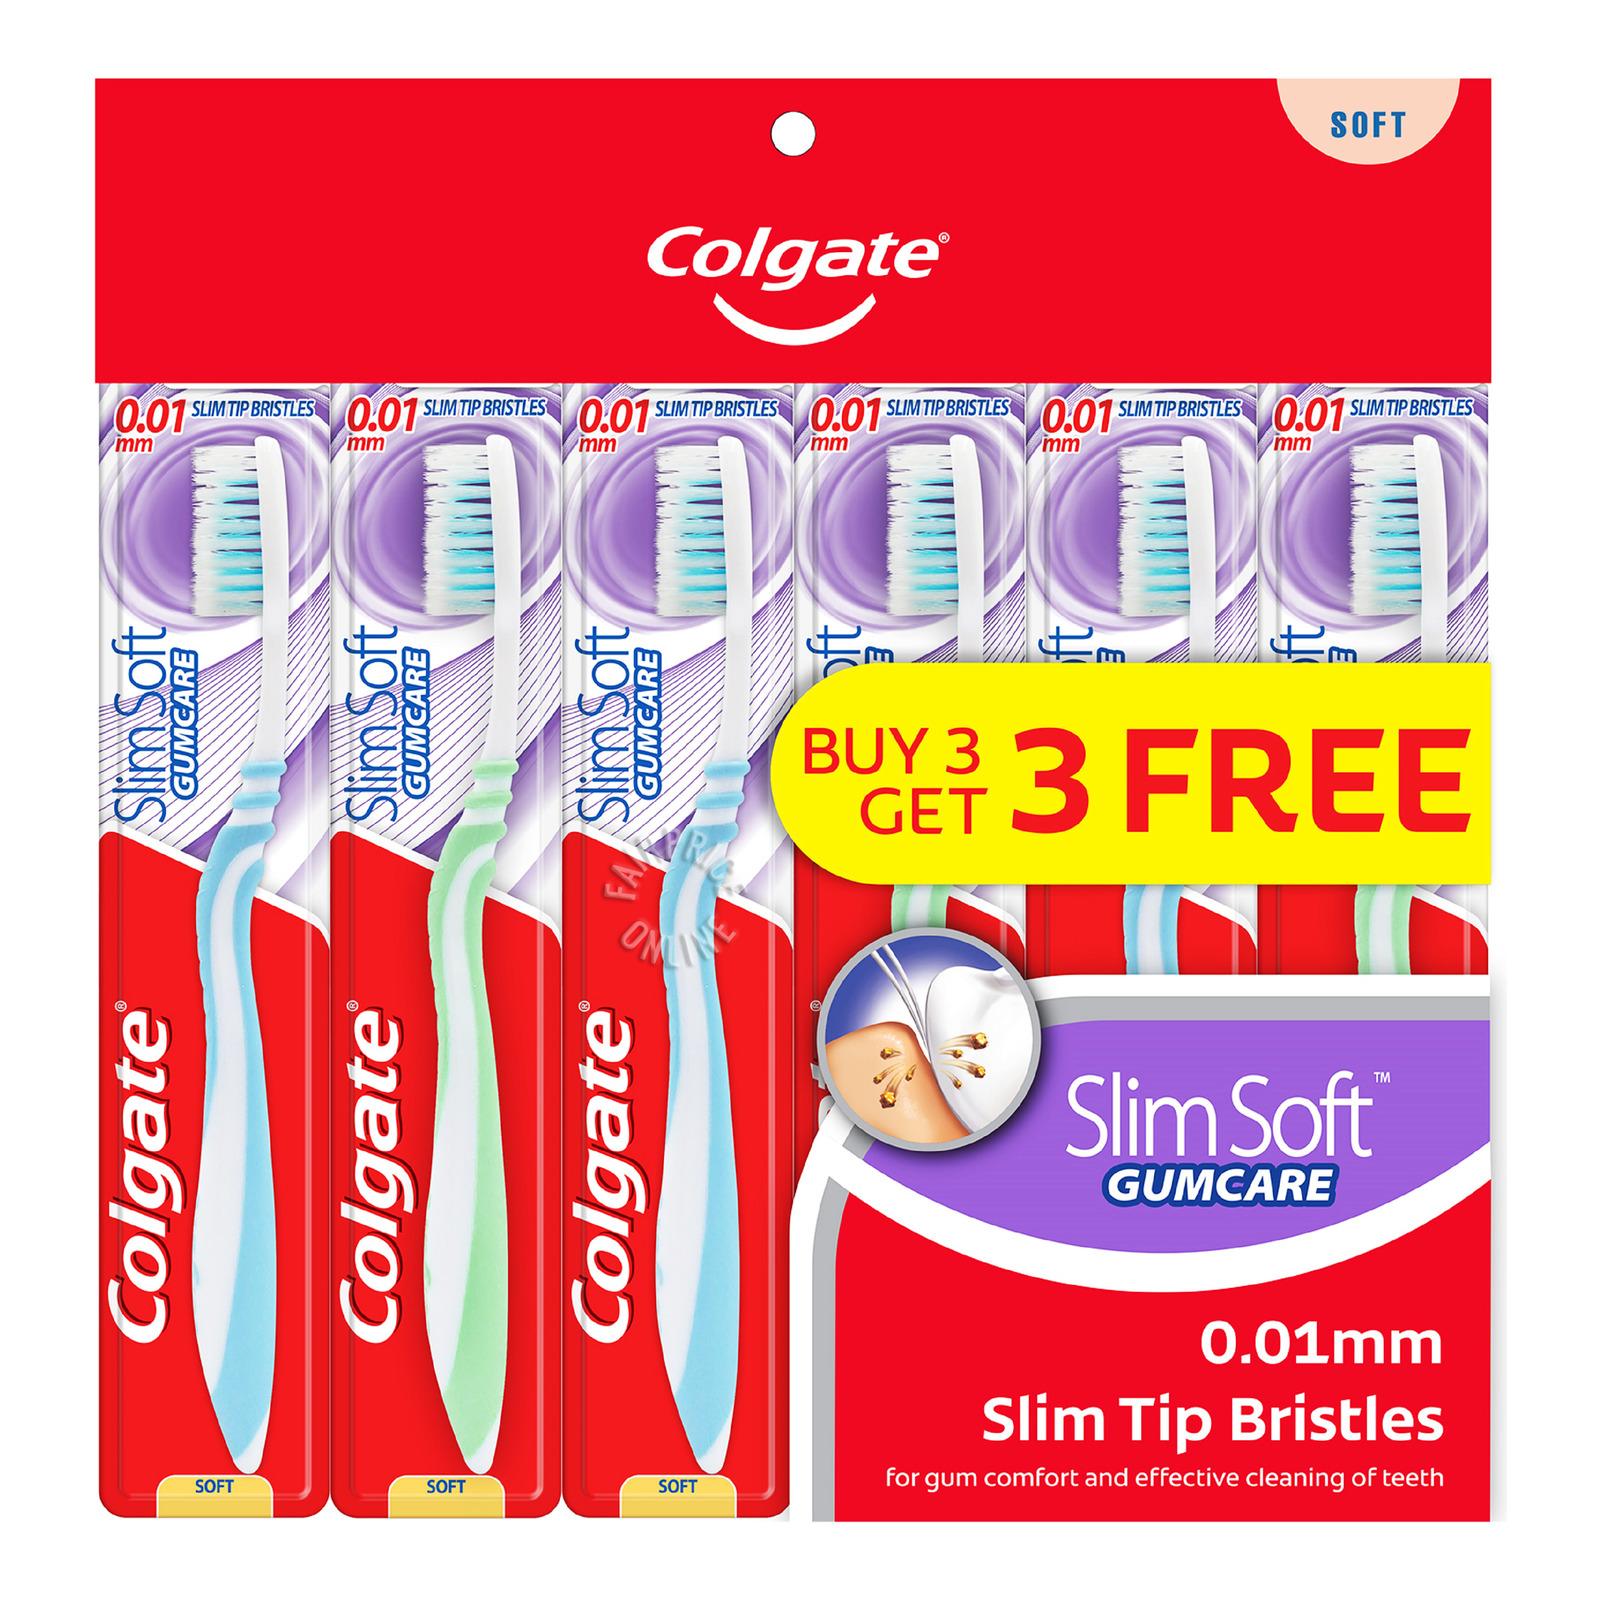 Colgate Slim Soft Toothbrush - Gumcare